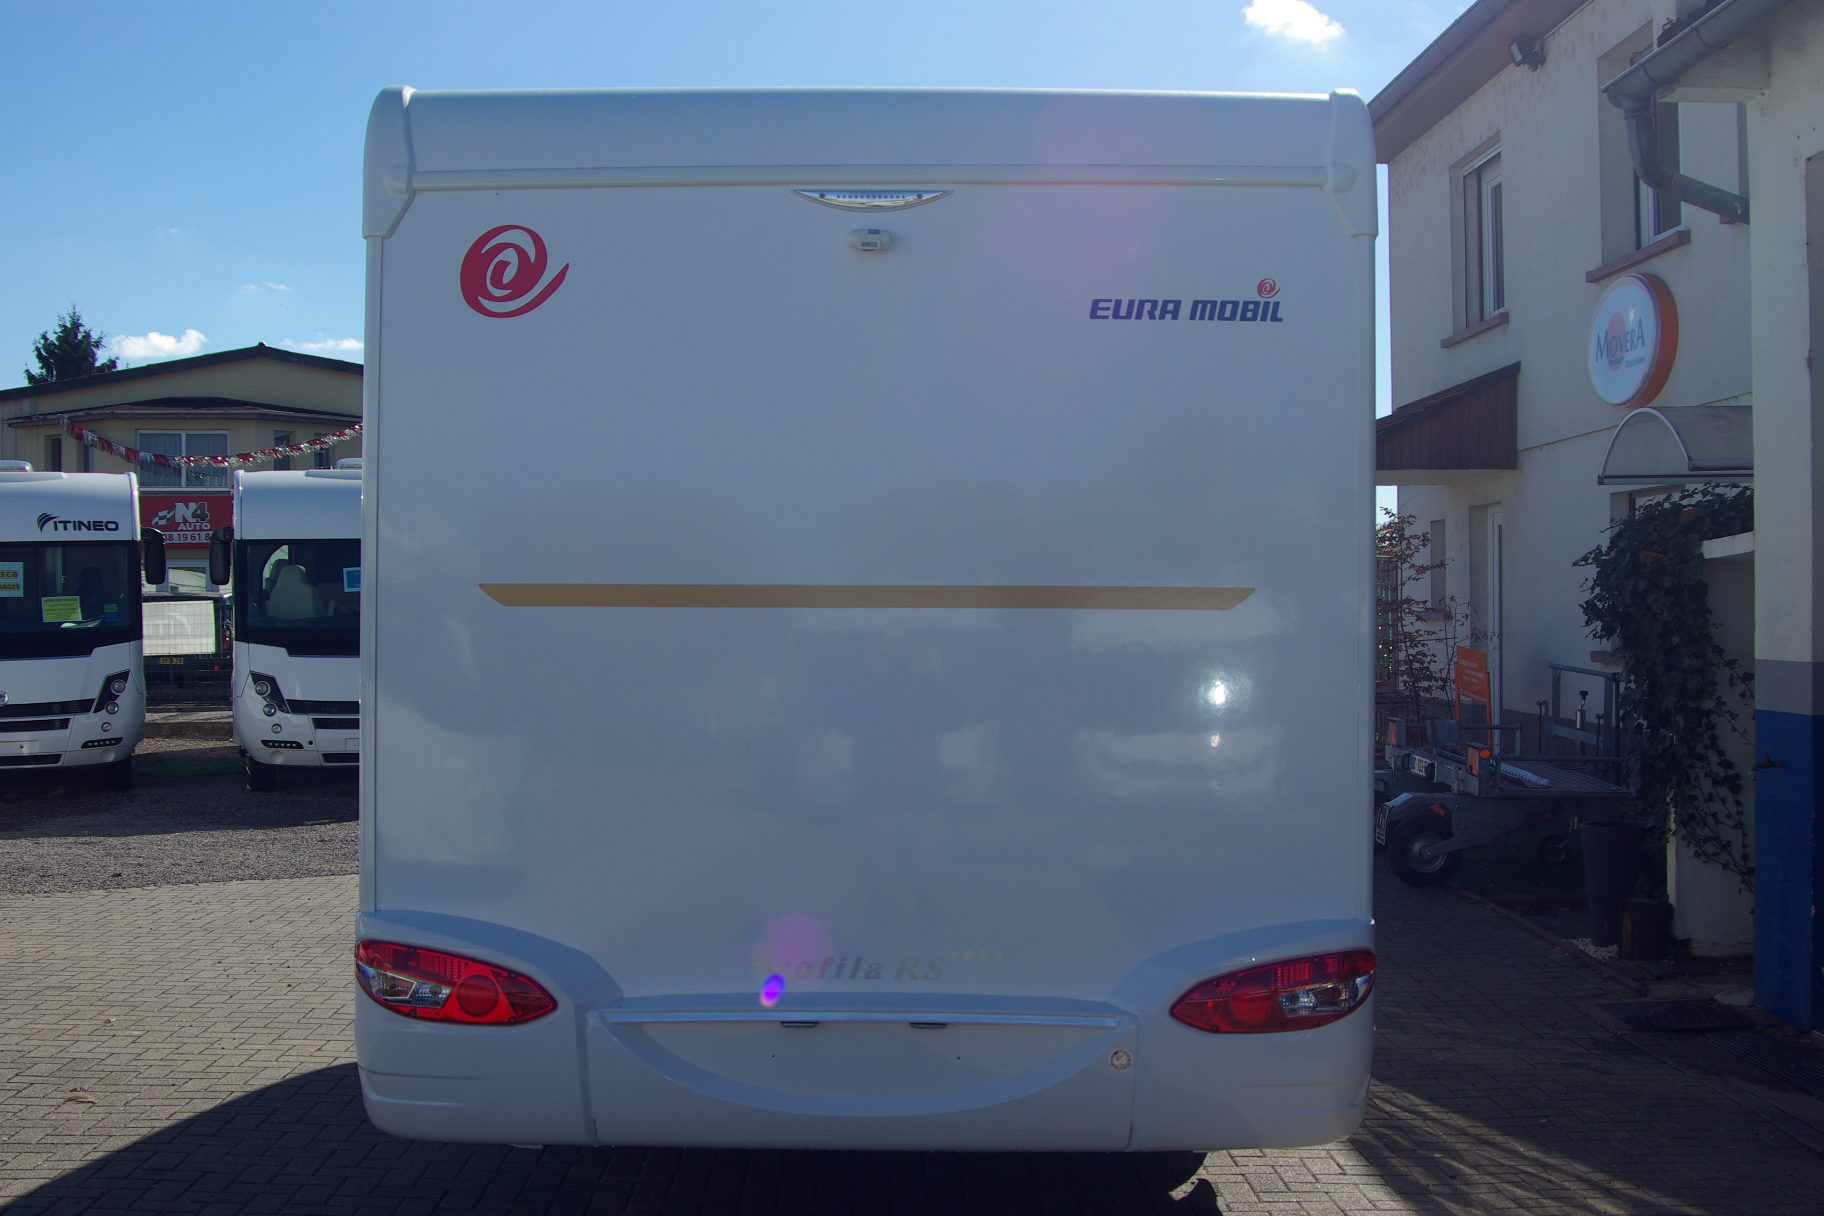 eura mobil profila rs 720 qb neuf de 2018 fiat camping car en vente duppigheim rhin 67. Black Bedroom Furniture Sets. Home Design Ideas